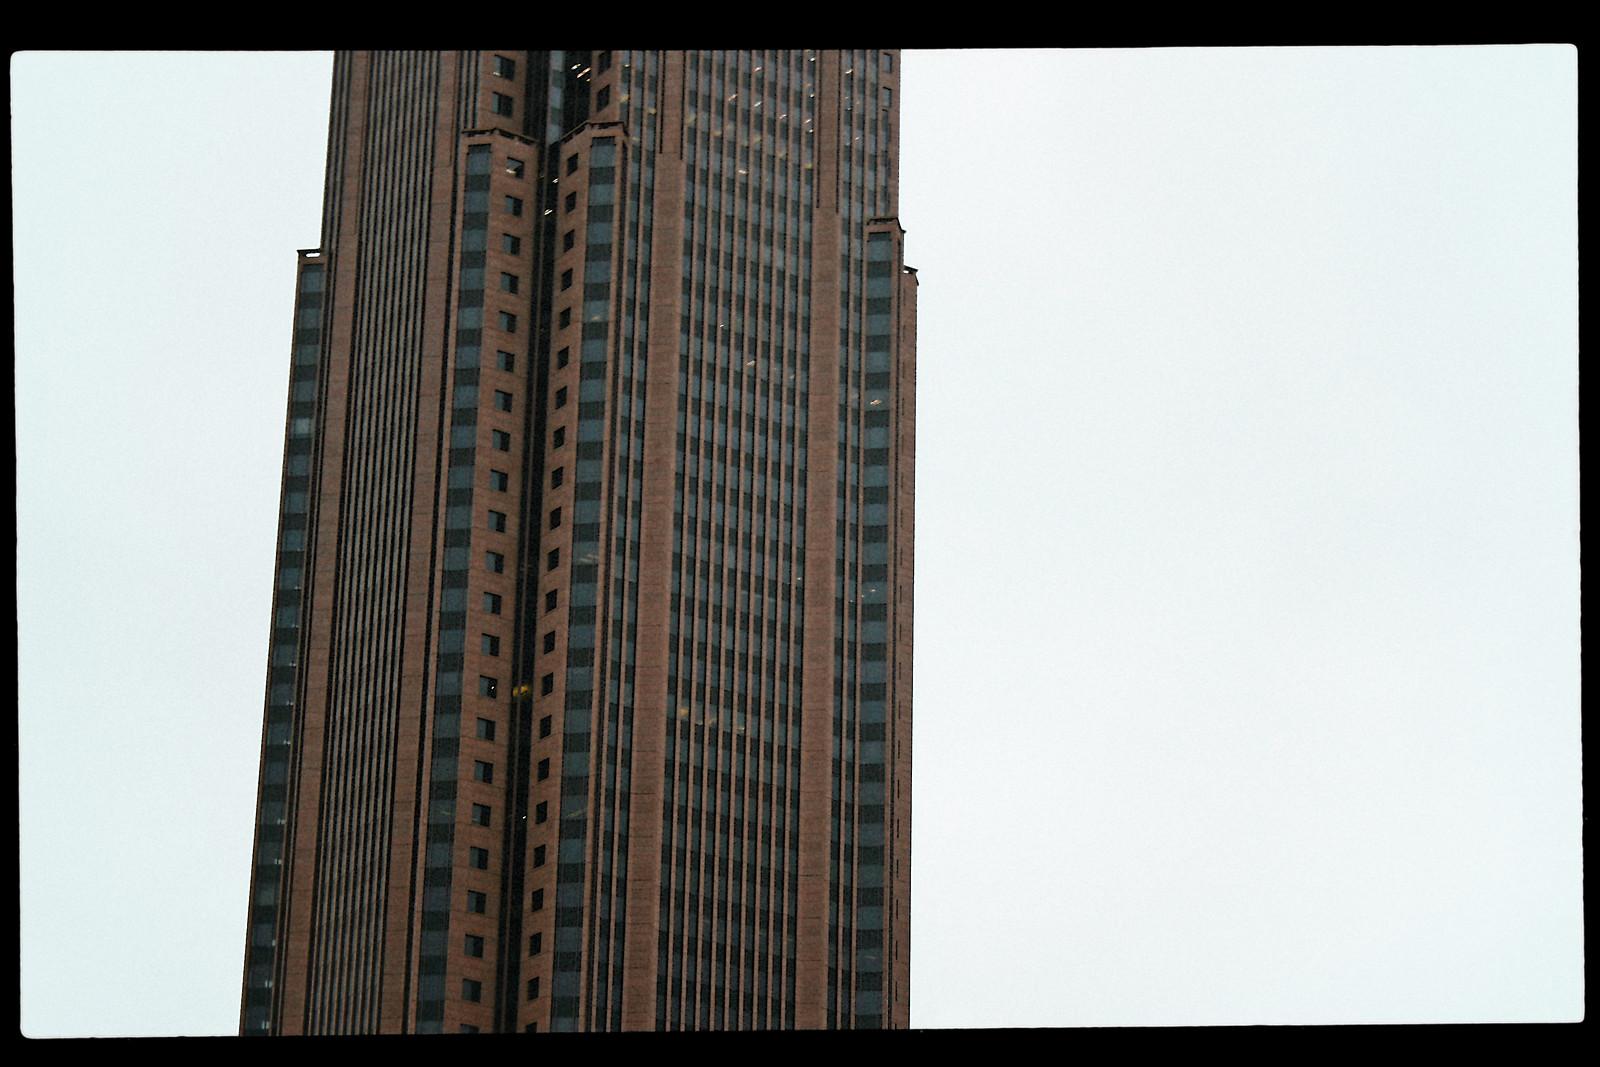 Bank of America Building, Atlanta